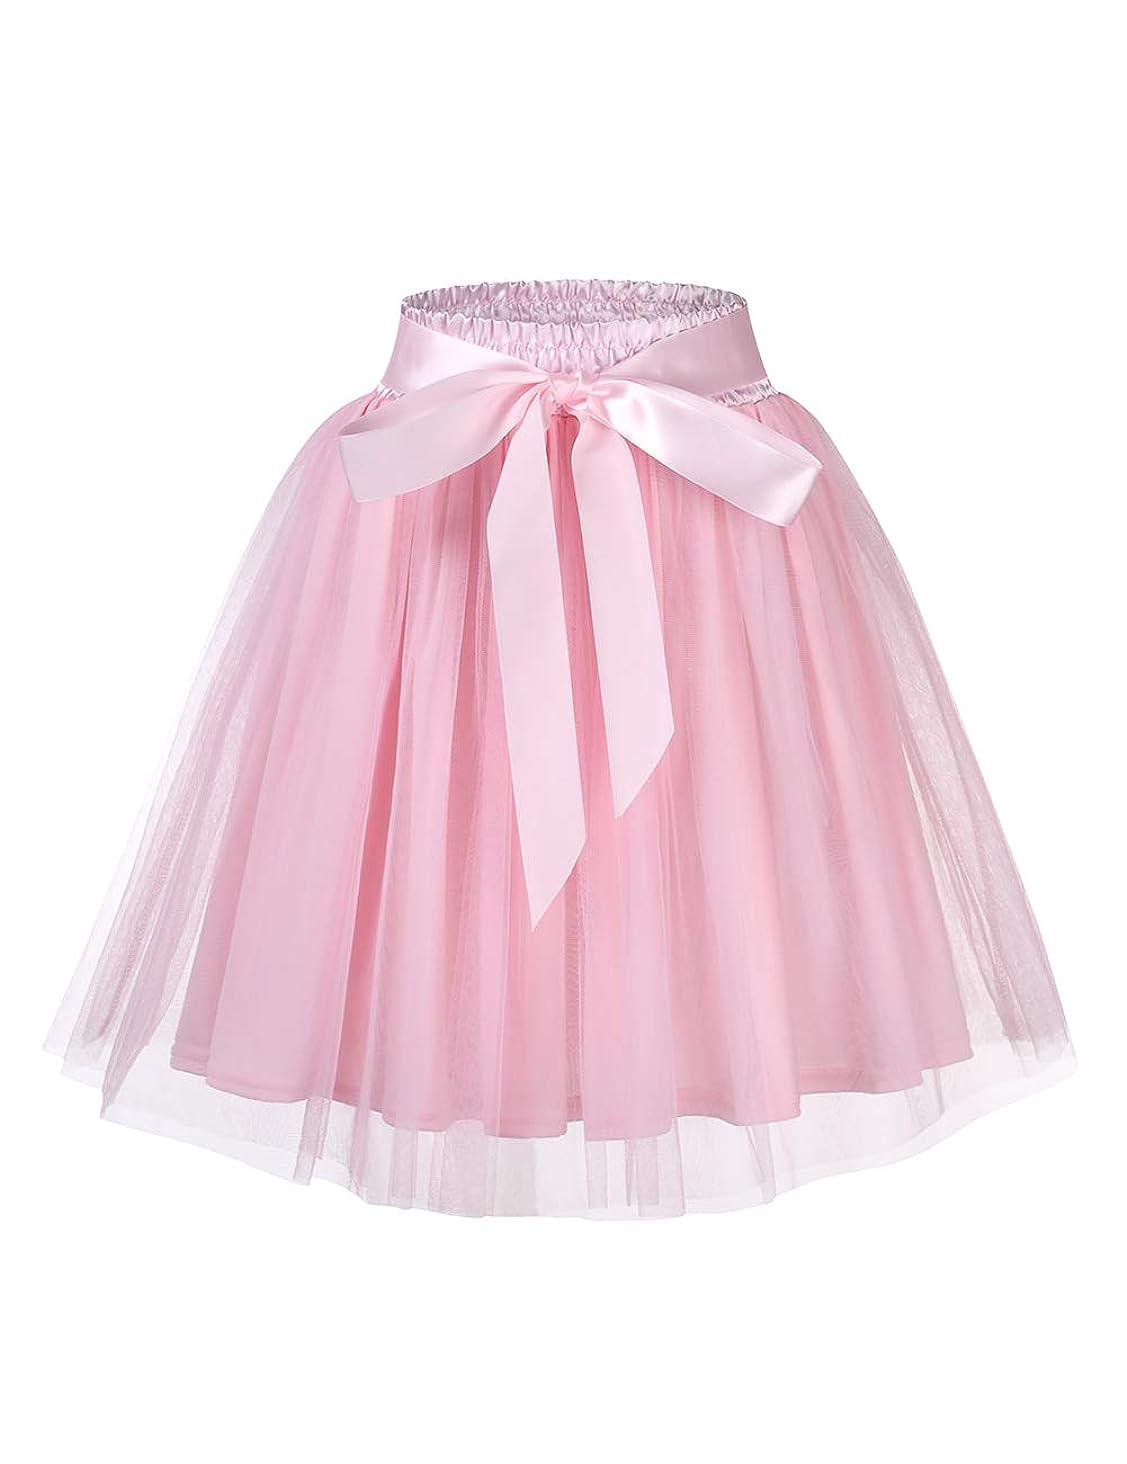 GlorySunshine Women's A Line Princess Tulle Wedding Prom Party Tutu Skirt